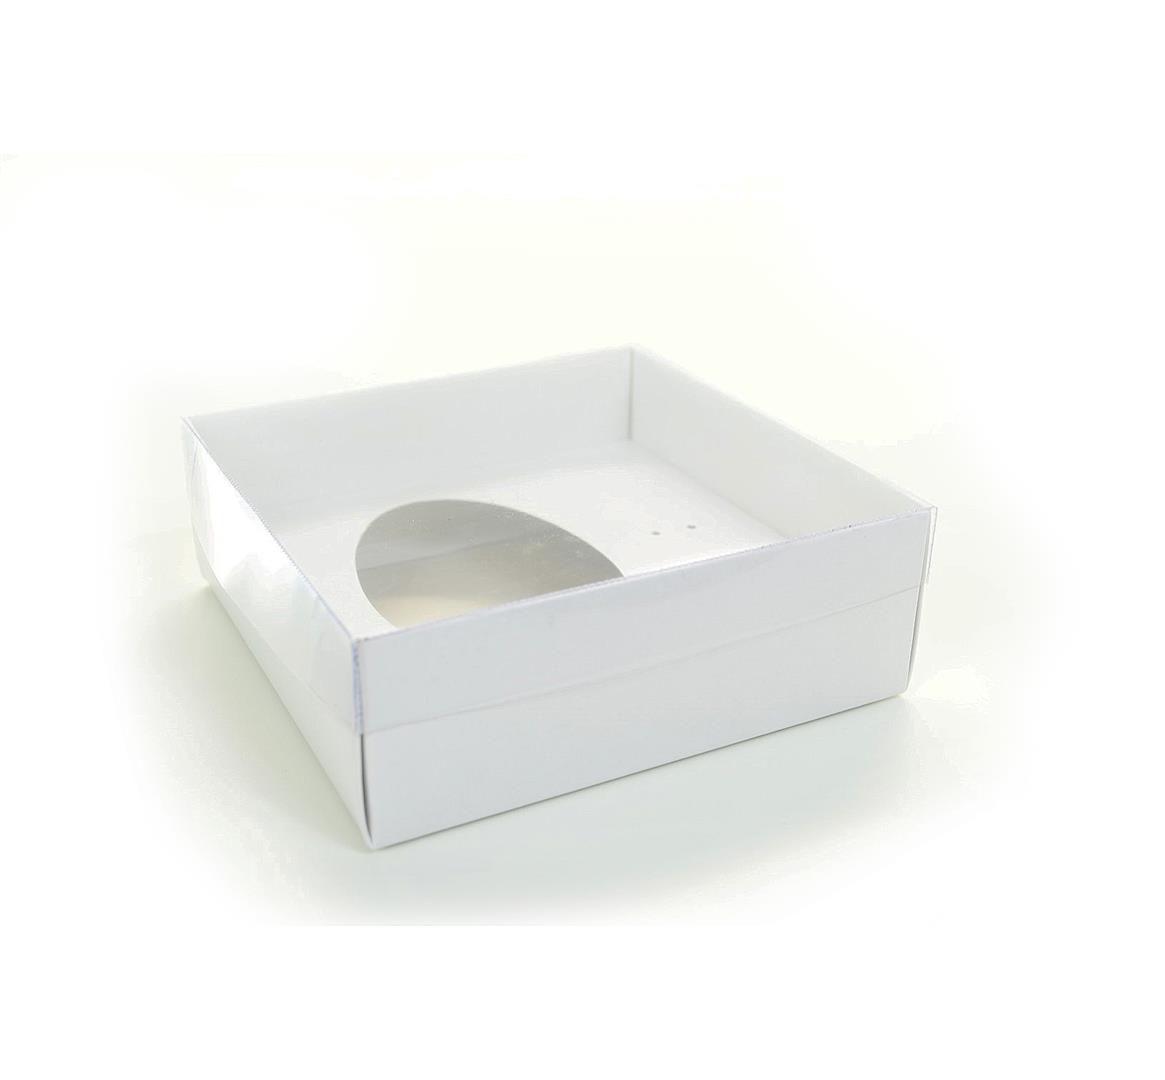 Ref 004 Branca - Caixa Ovo 250/350 gr. c/ Tampa ALTA - 17,5x17,5x8 cm - c/ 10 unidades